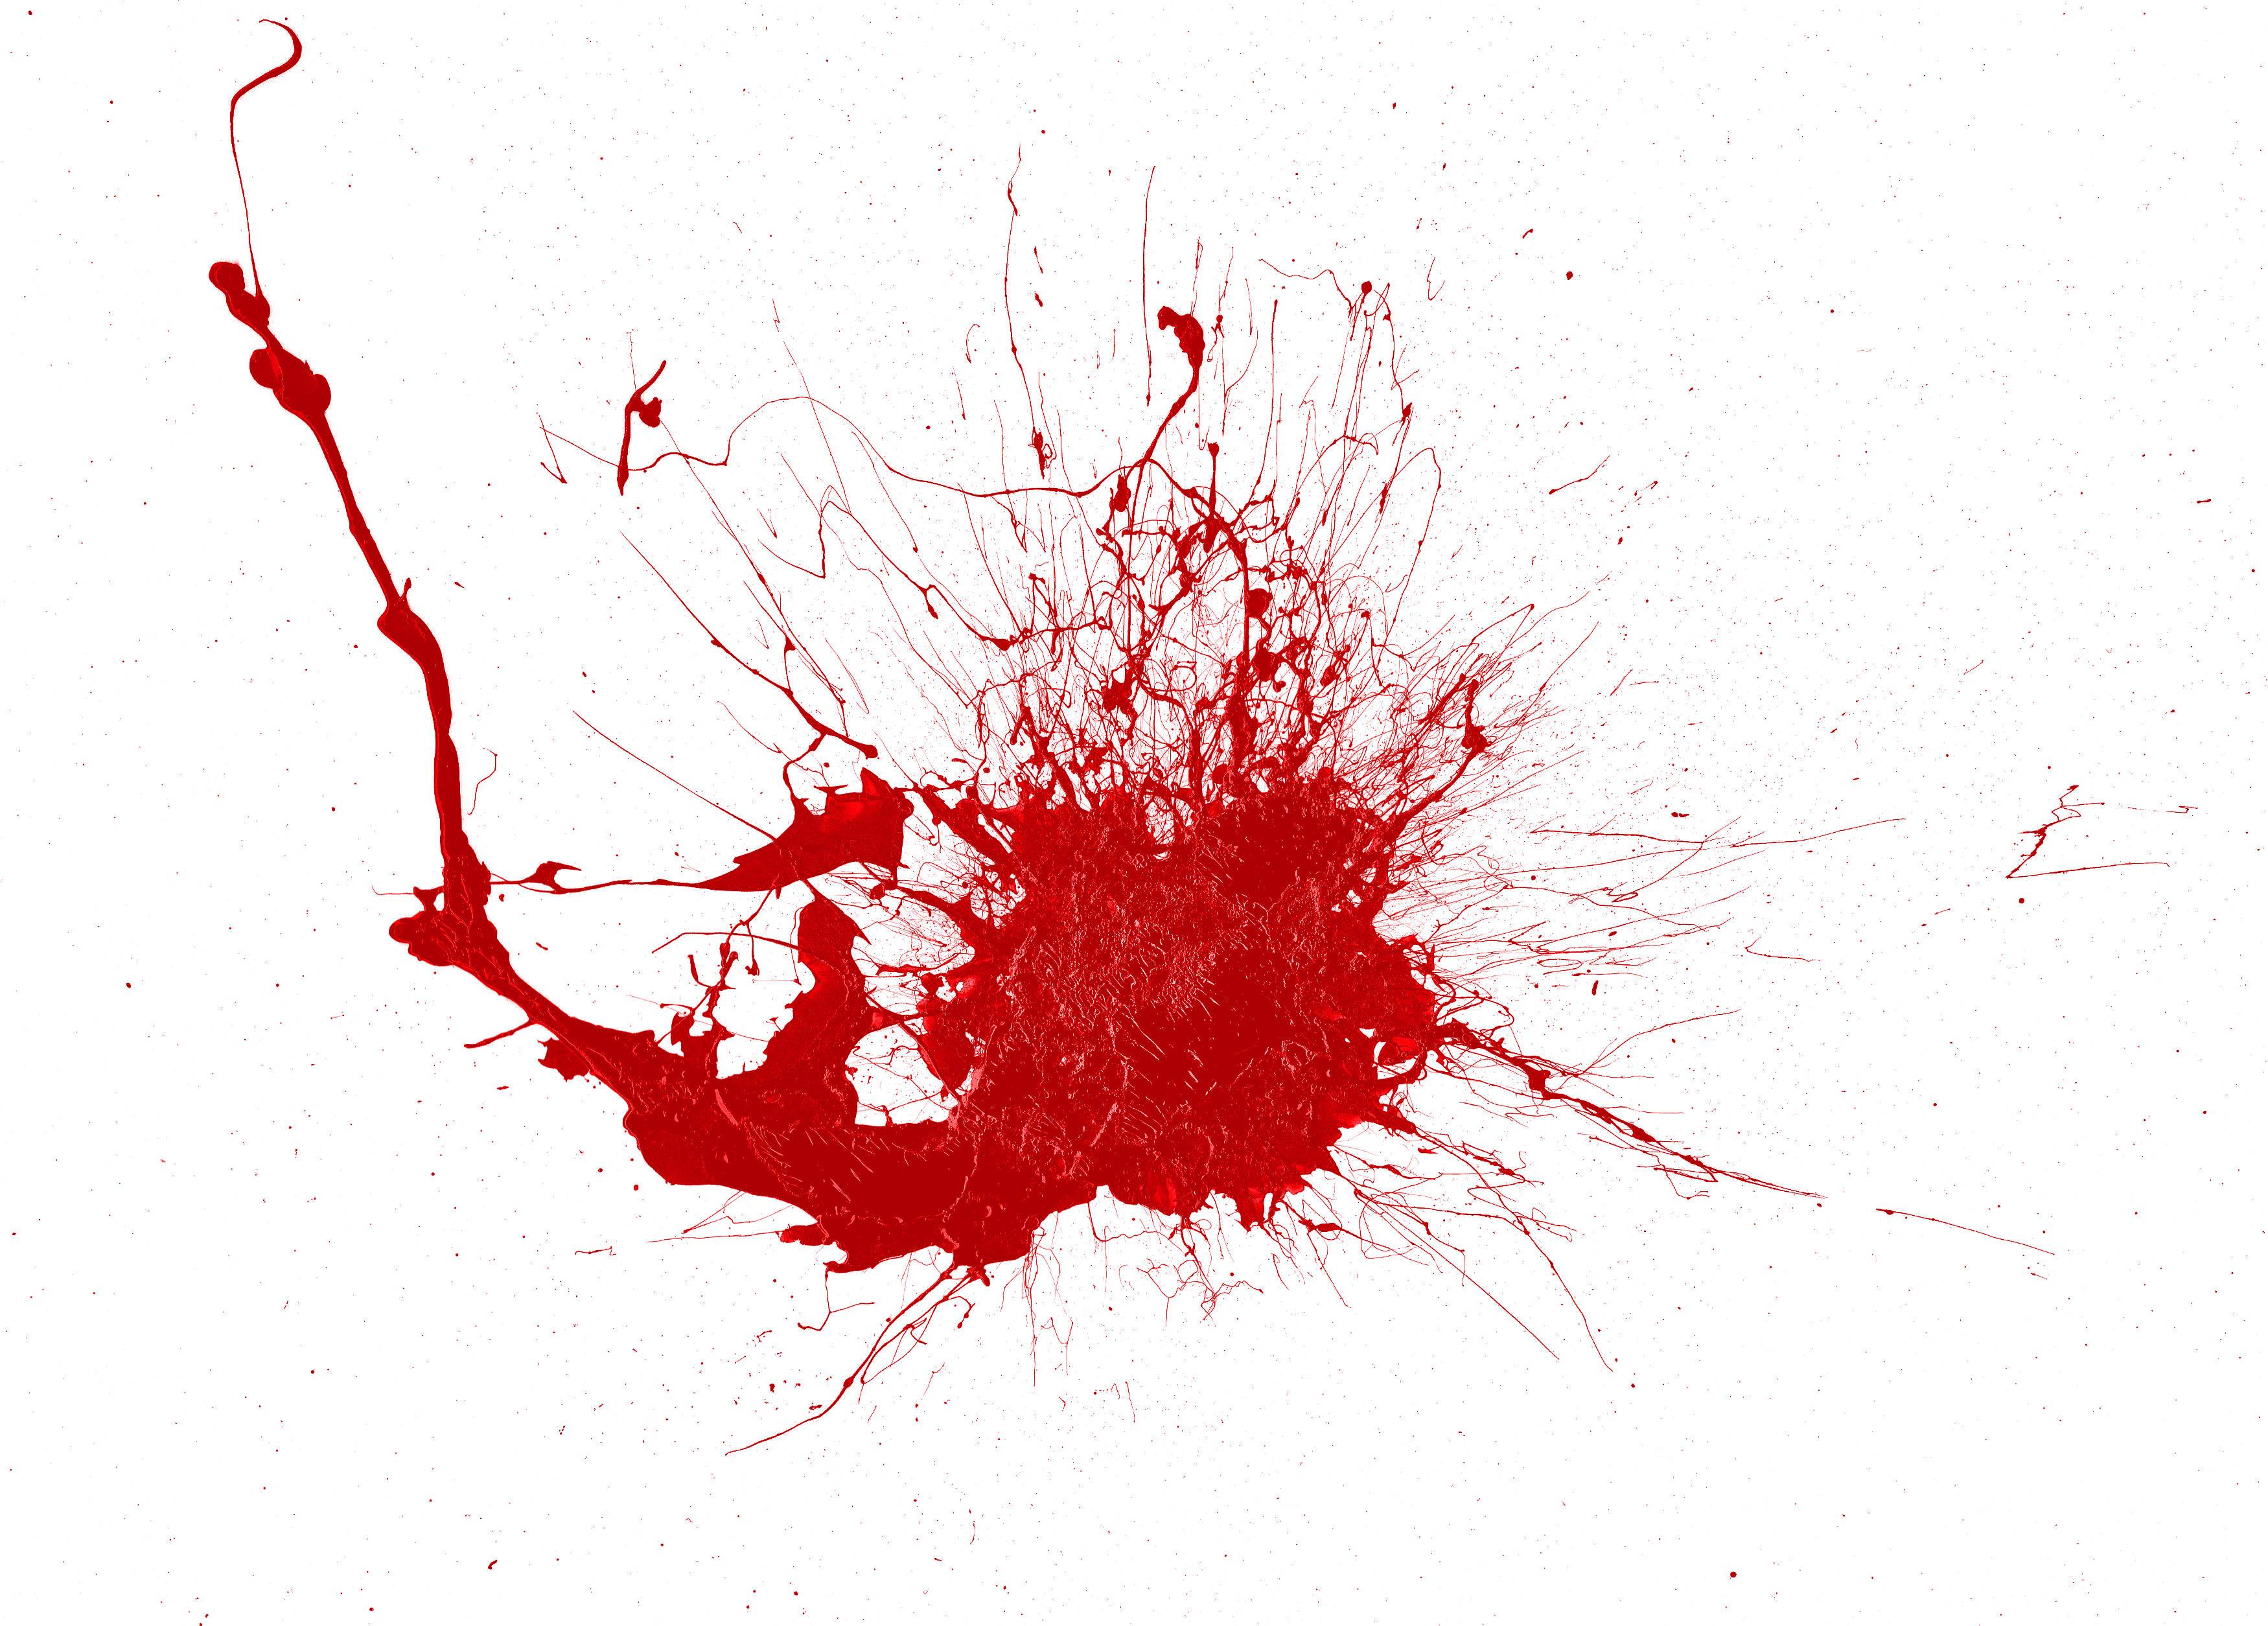 10 Blood Paint Splatter Background Jpg Onlygfx Com Download 4,210 blood splatter free vectors. 10 blood paint splatter background jpg